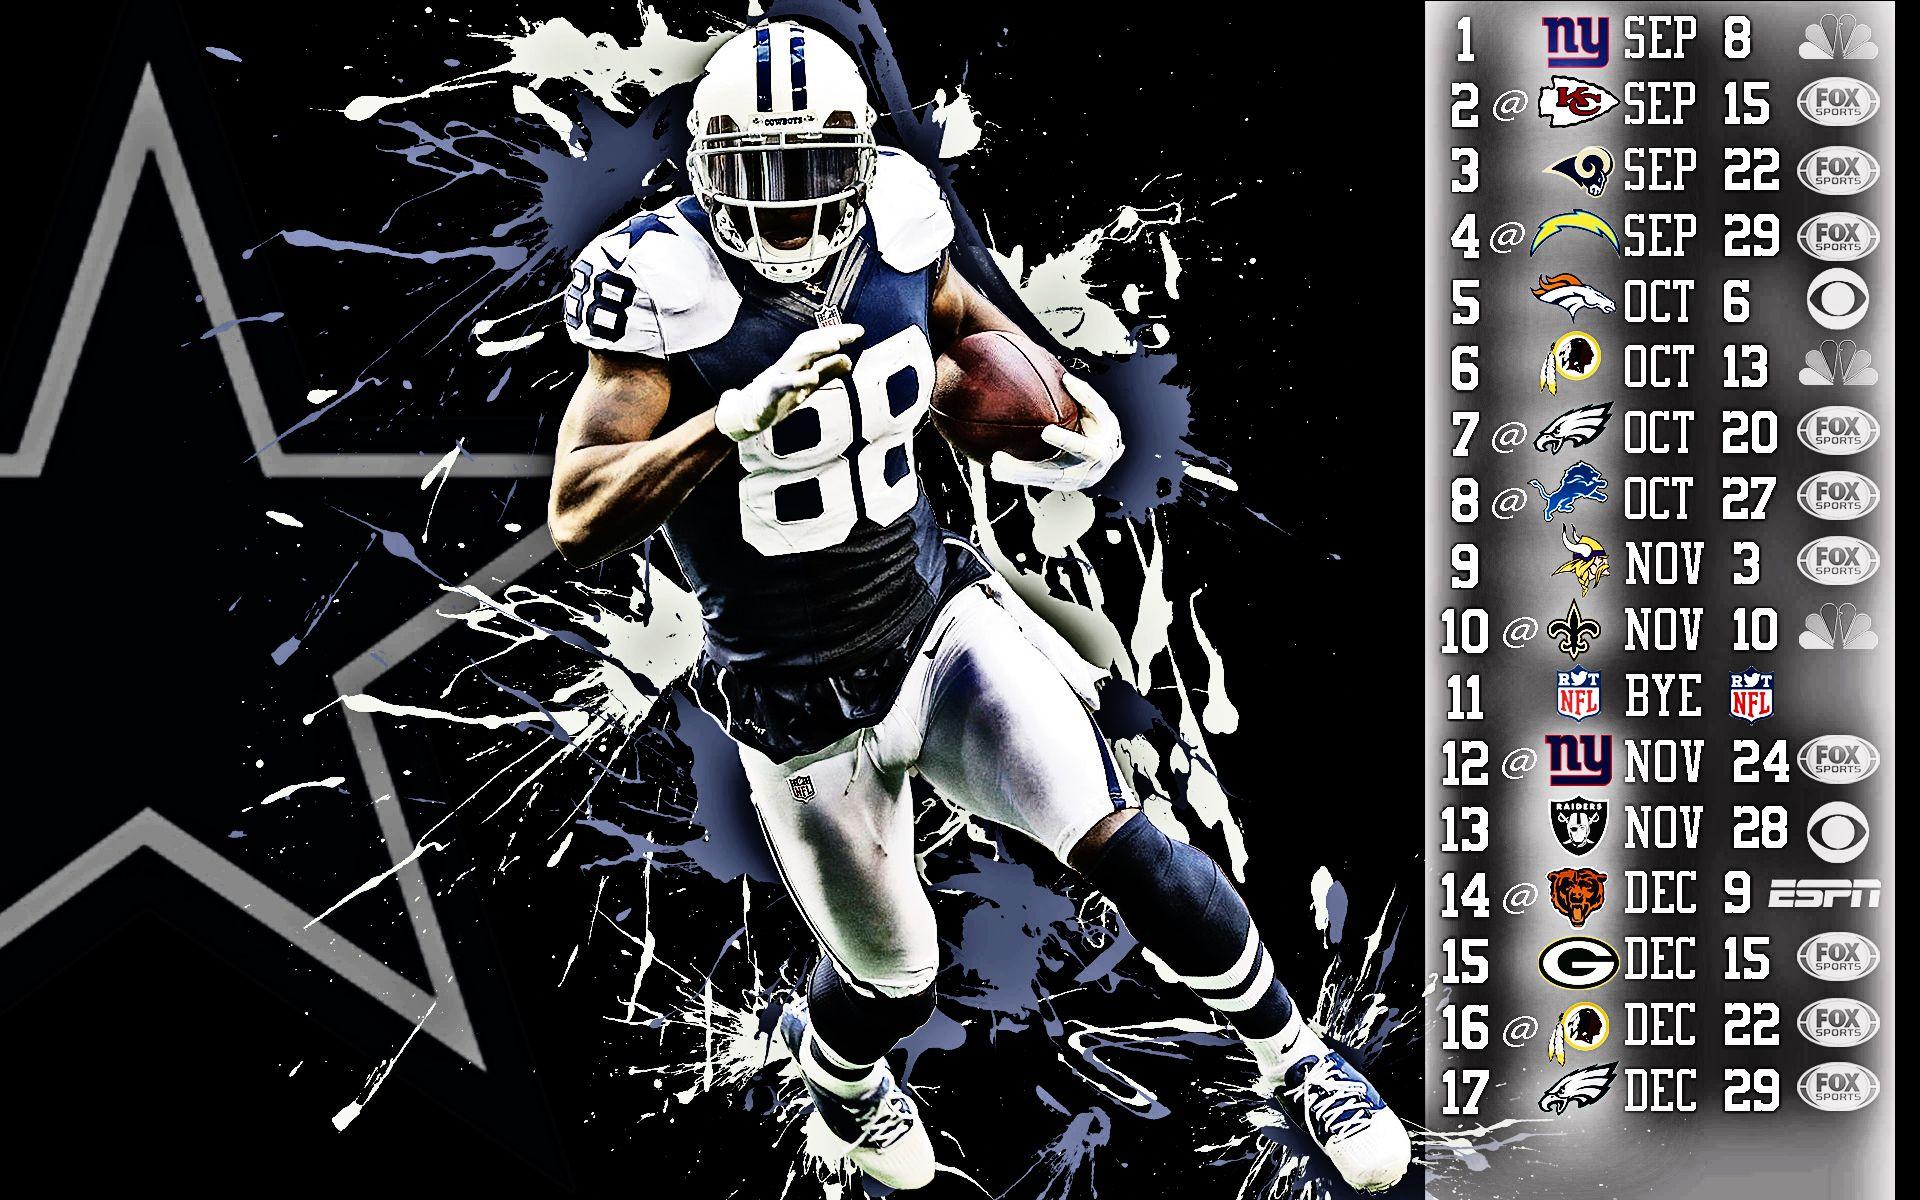 Dallas Cowboys HD desktop wallpaper High Definition